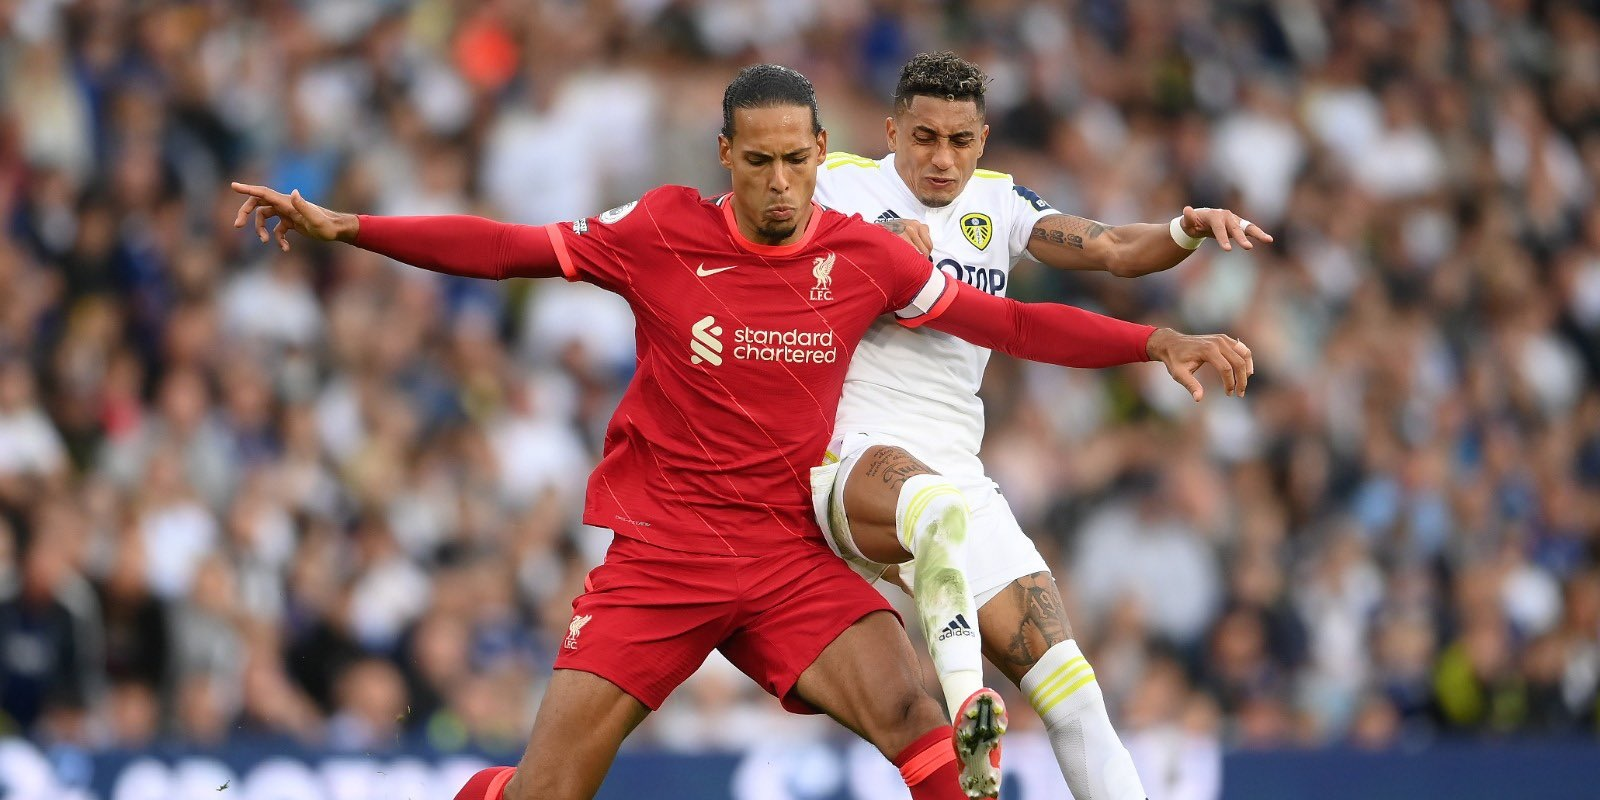 Liverpool team news confirmed as Klopp makes huge Virgil van Dijk call and Origi starts